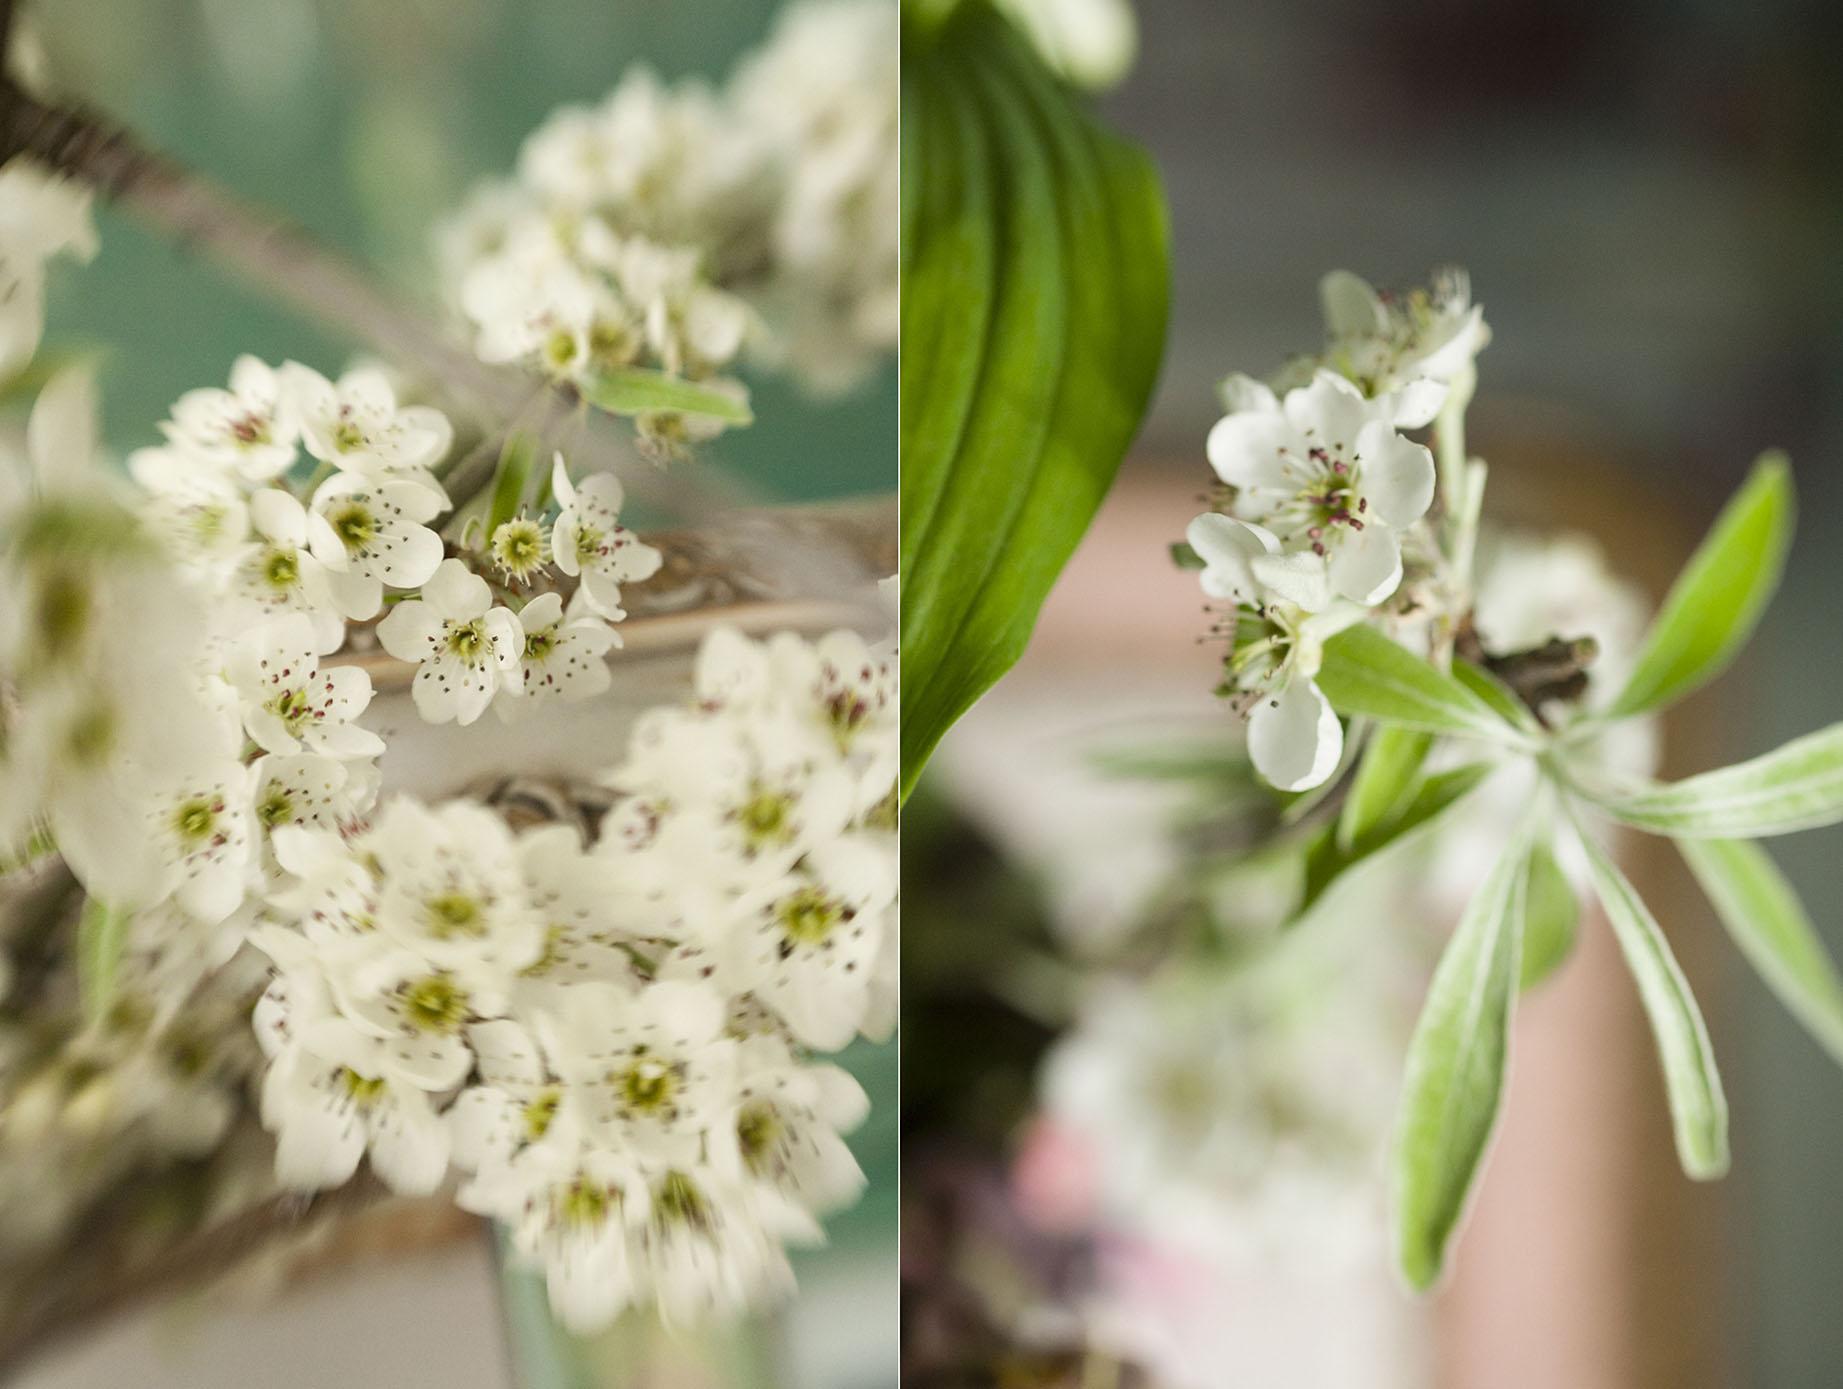 Flower_Book_Day2_070_pair.jpg